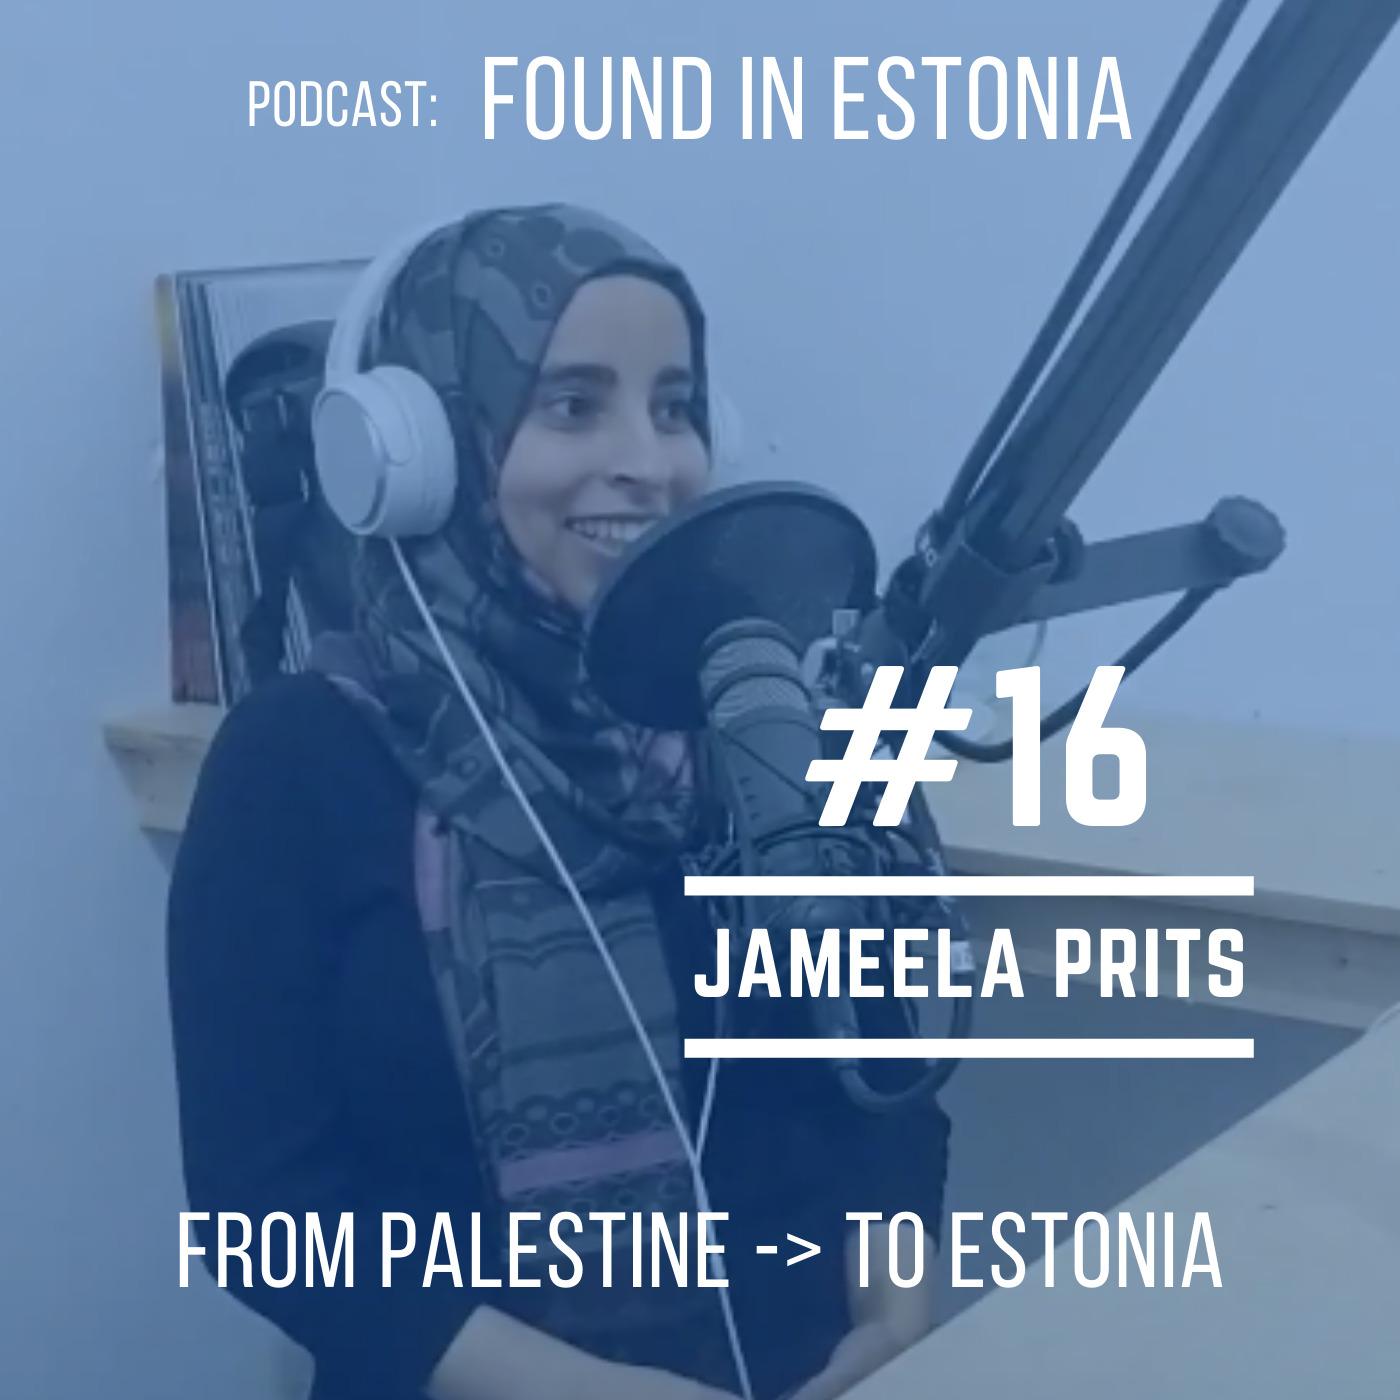 #16 Jameela Prits from Palestine to Estonia